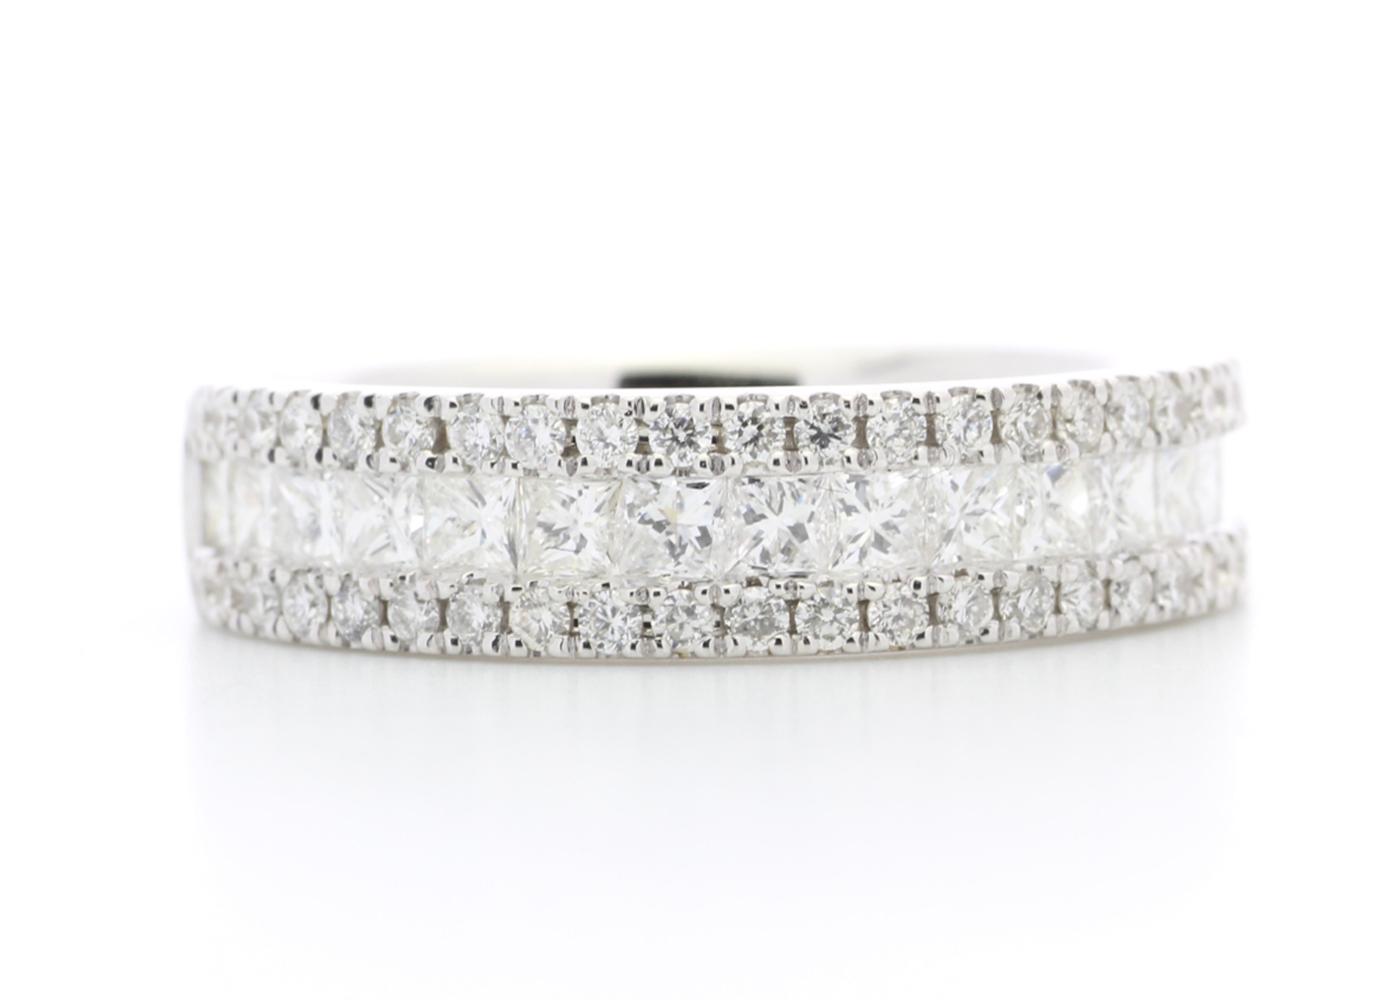 Lot 28 - 18ct White Gold Channel Set Semi Eternity Diamond Ring 1.00 Carats